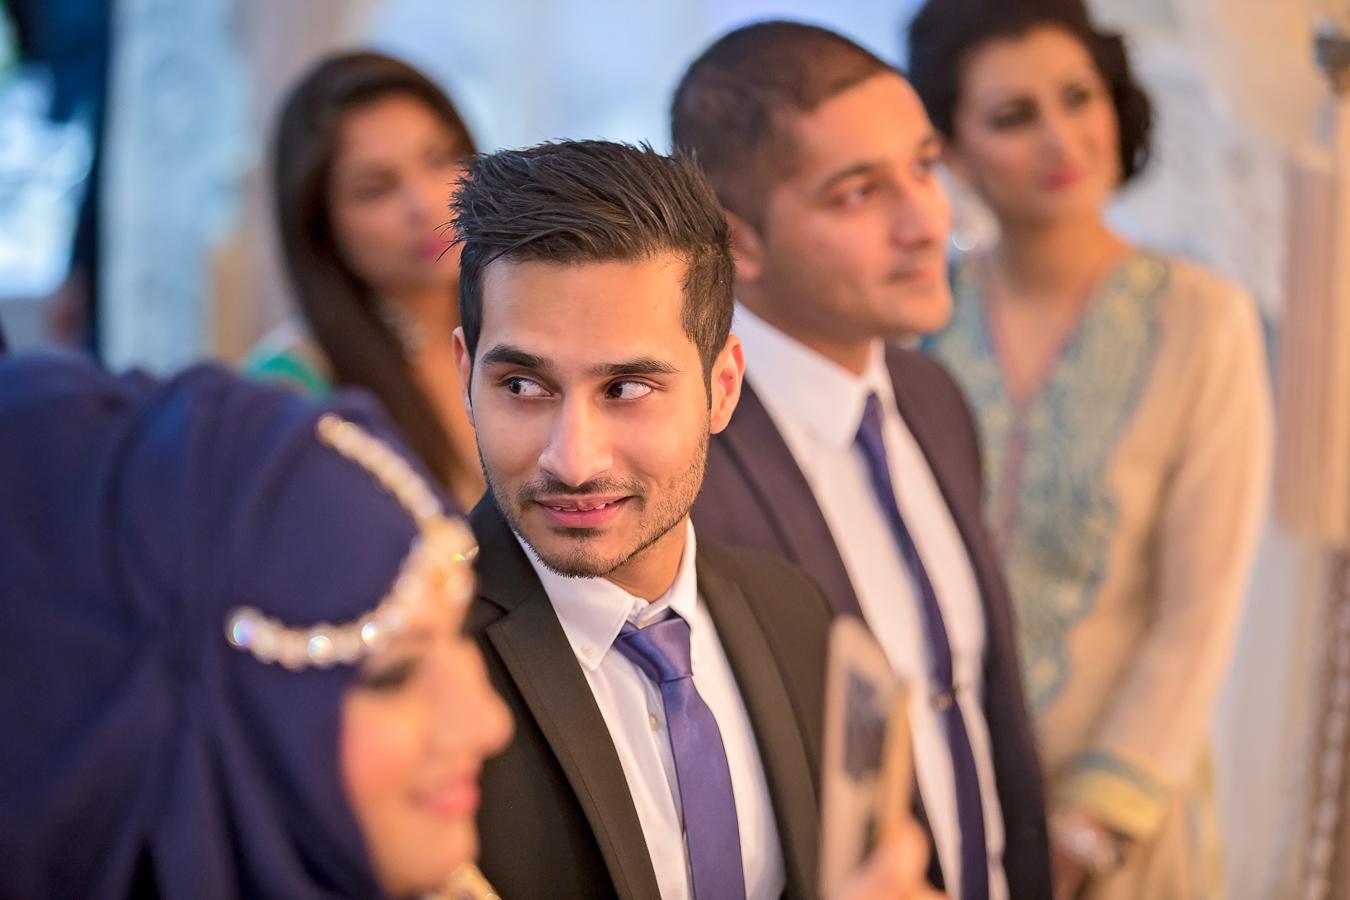 Nasir and Minara wedding at The Sheridan suite Macnchester Didsbury Opu Sultan Photography Manchester and Edinburgh Asian Muslim Hindu Sikh-110.jpg